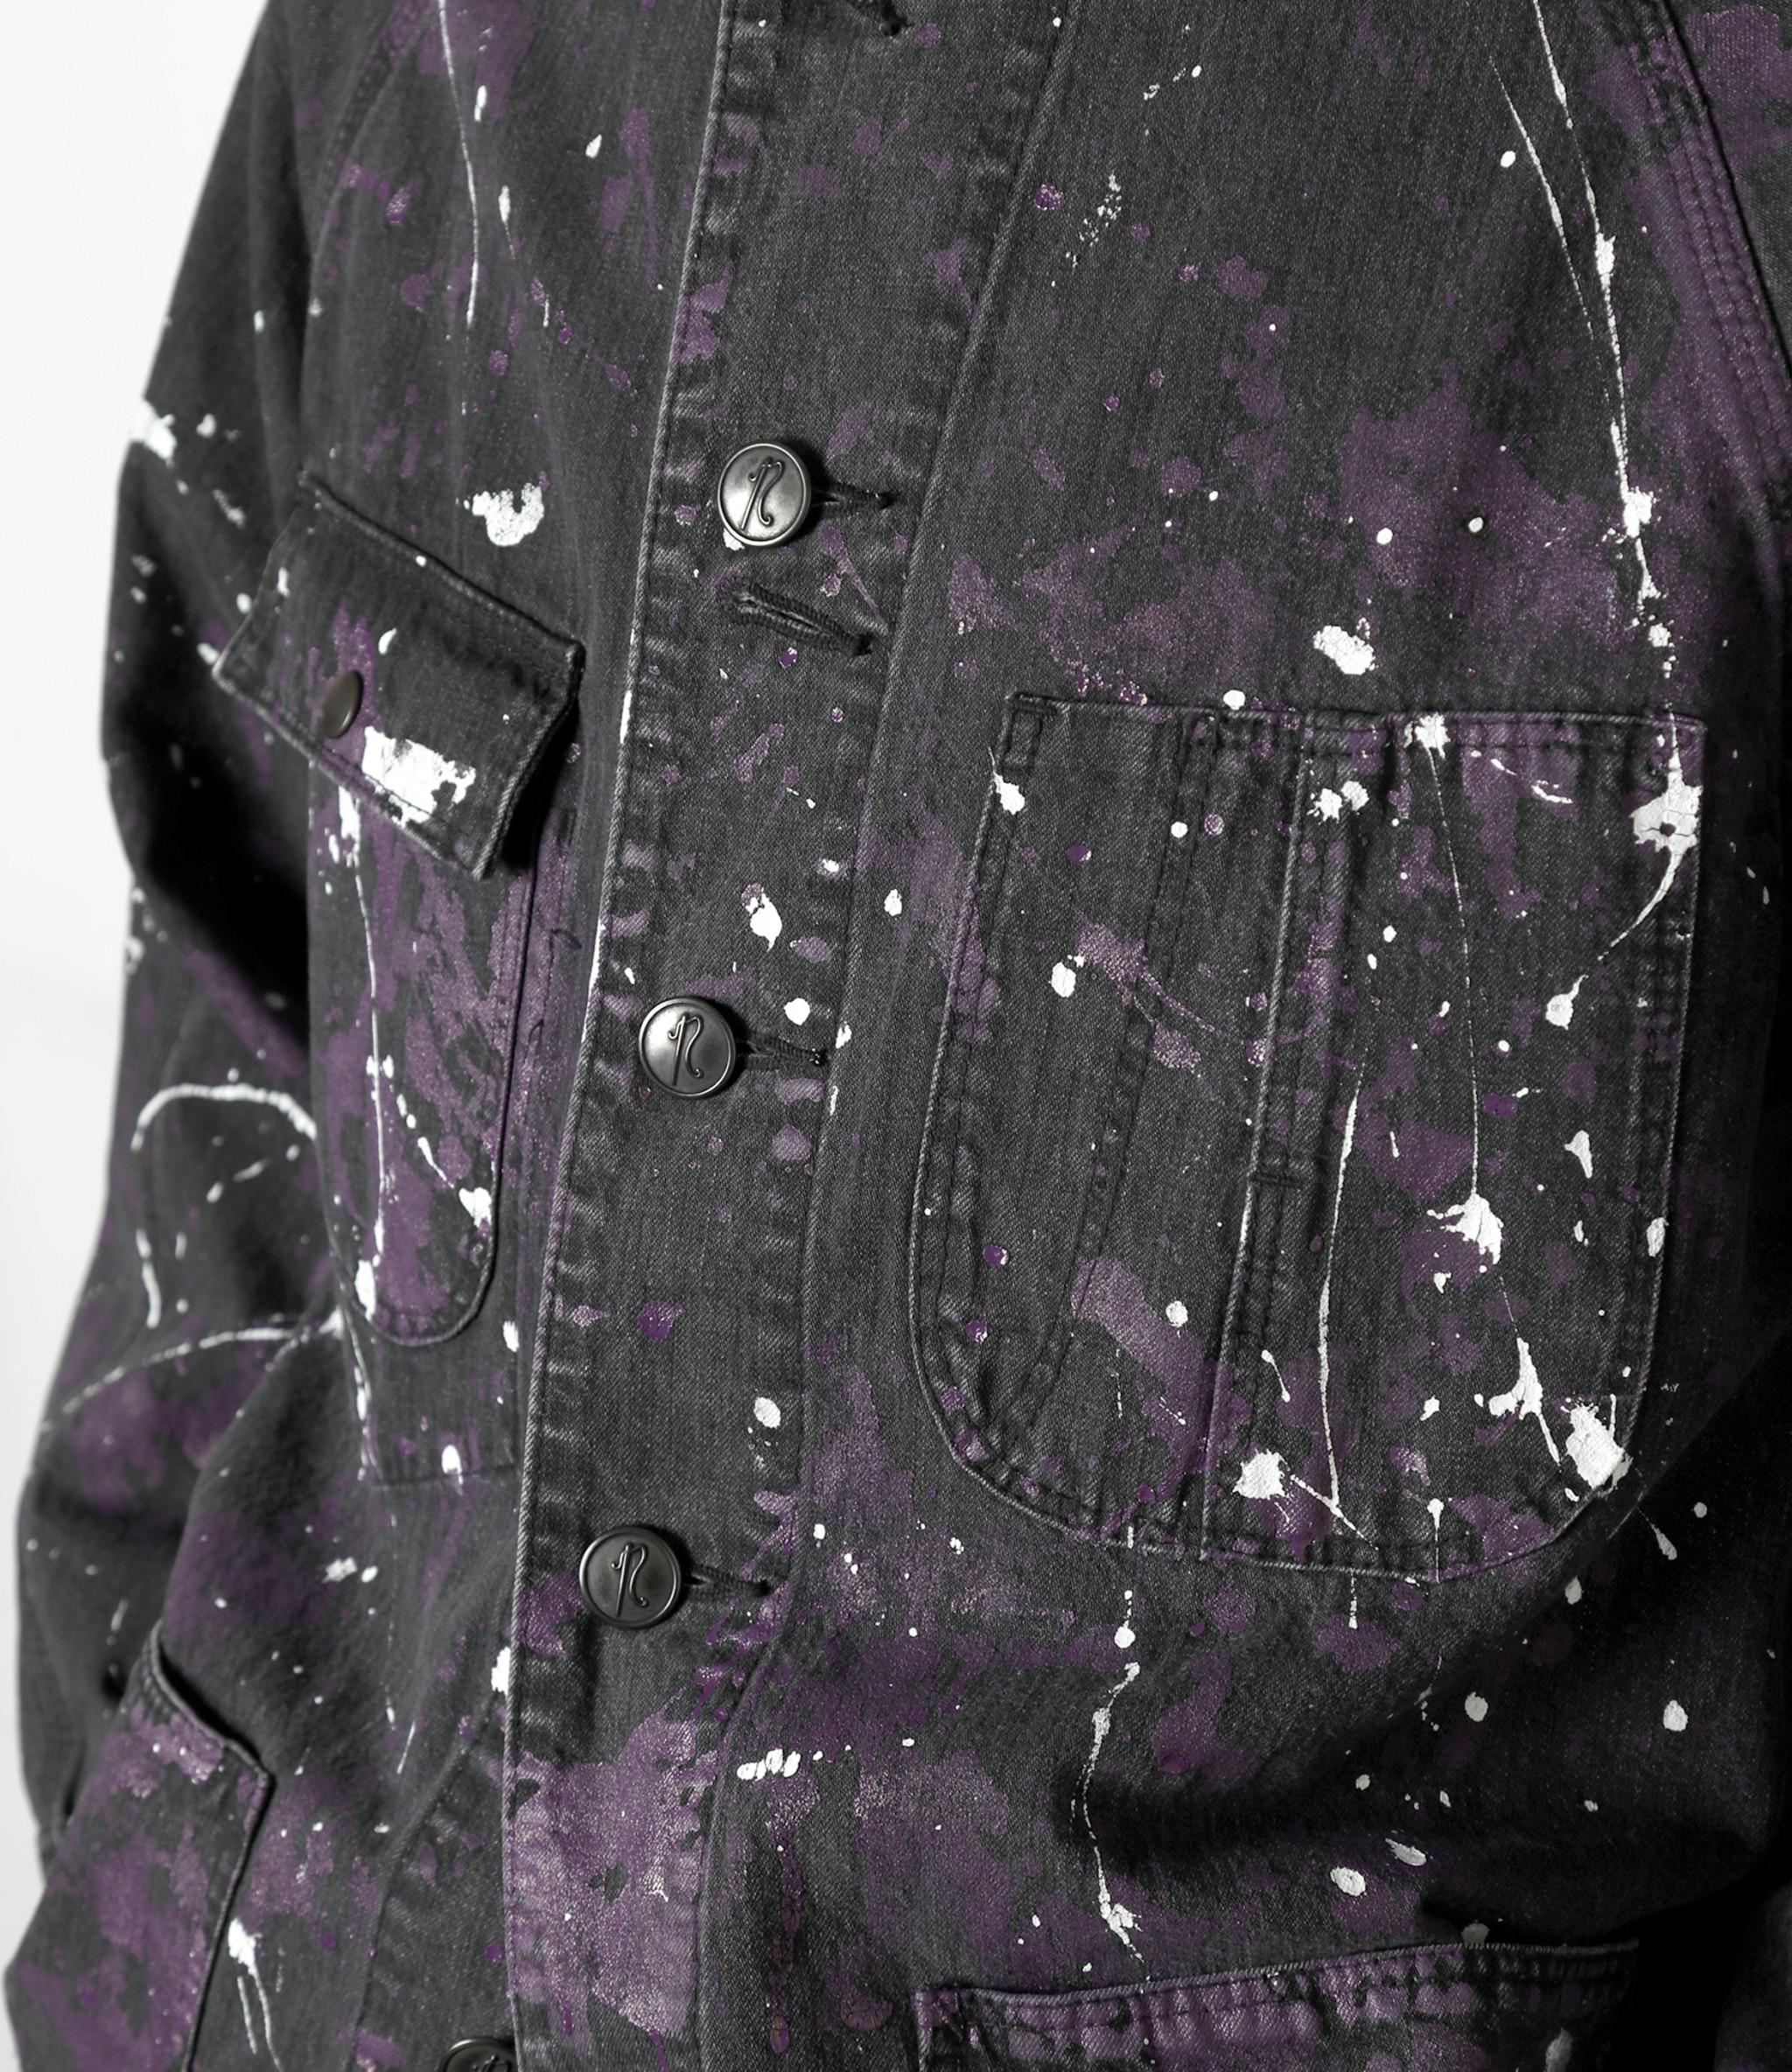 Needles Chore Coat - 10oz Denim / Paint - Black